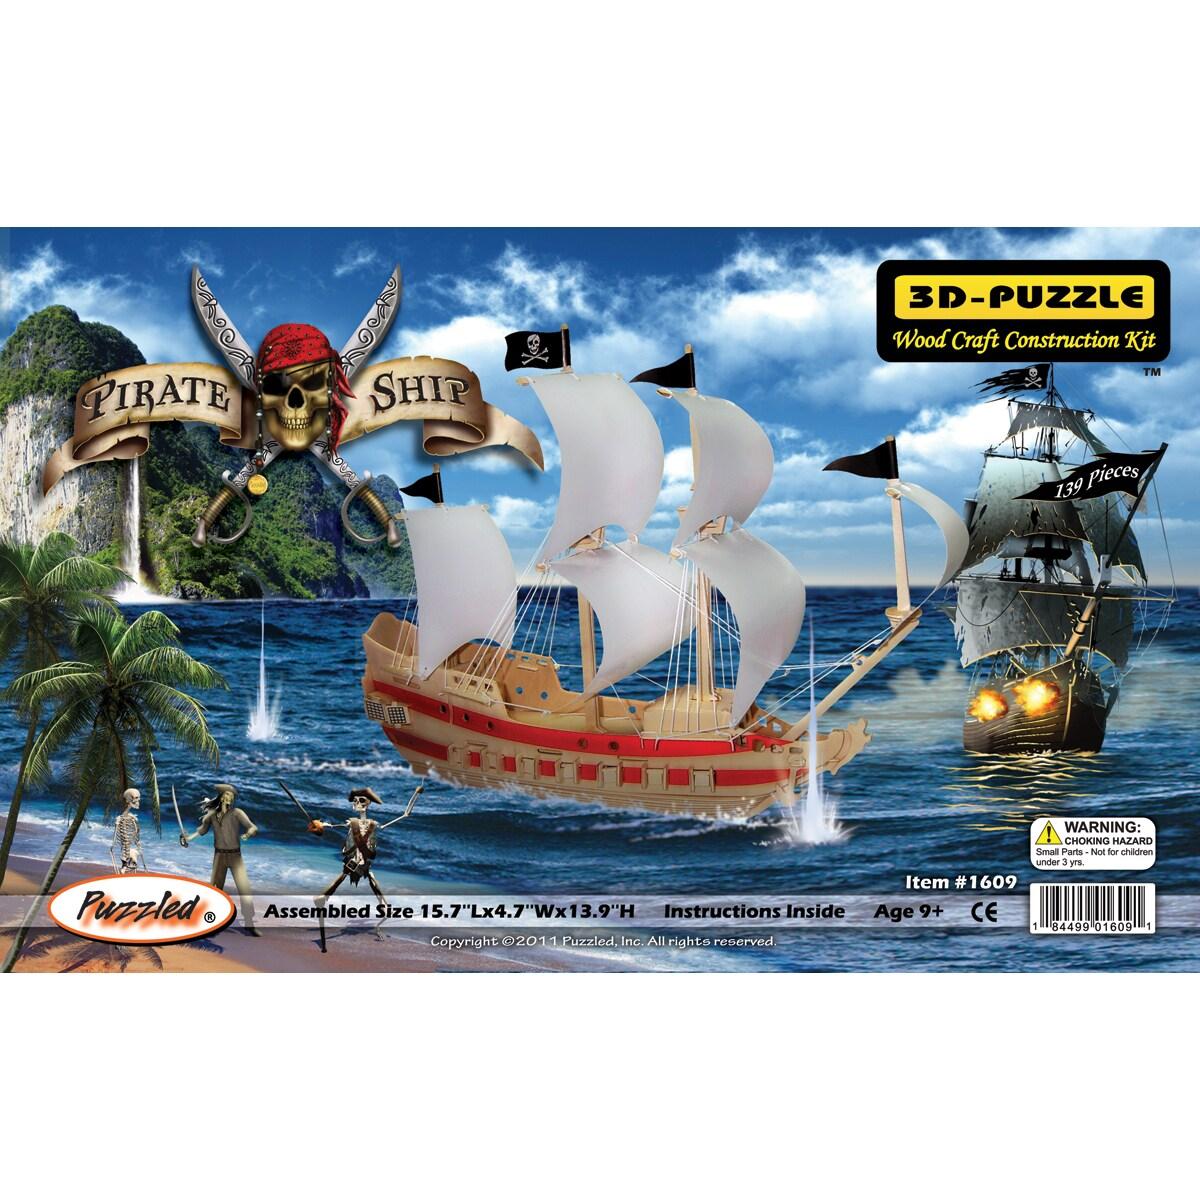 3D 139-piece Pirate Ship Jigsaw Puzzle